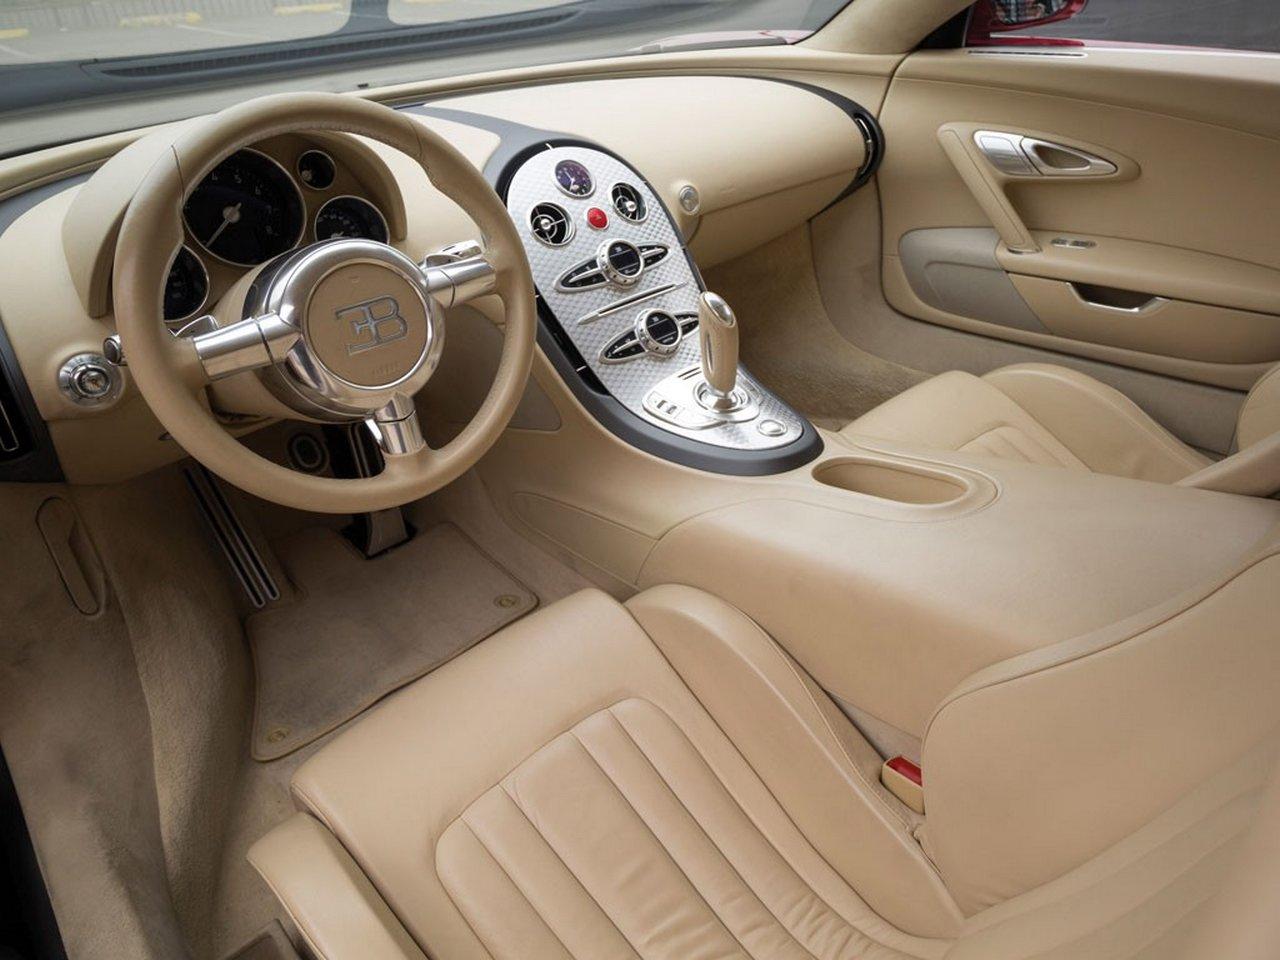 bugatti-veyron-001-2005-rm-auction-0-100-4